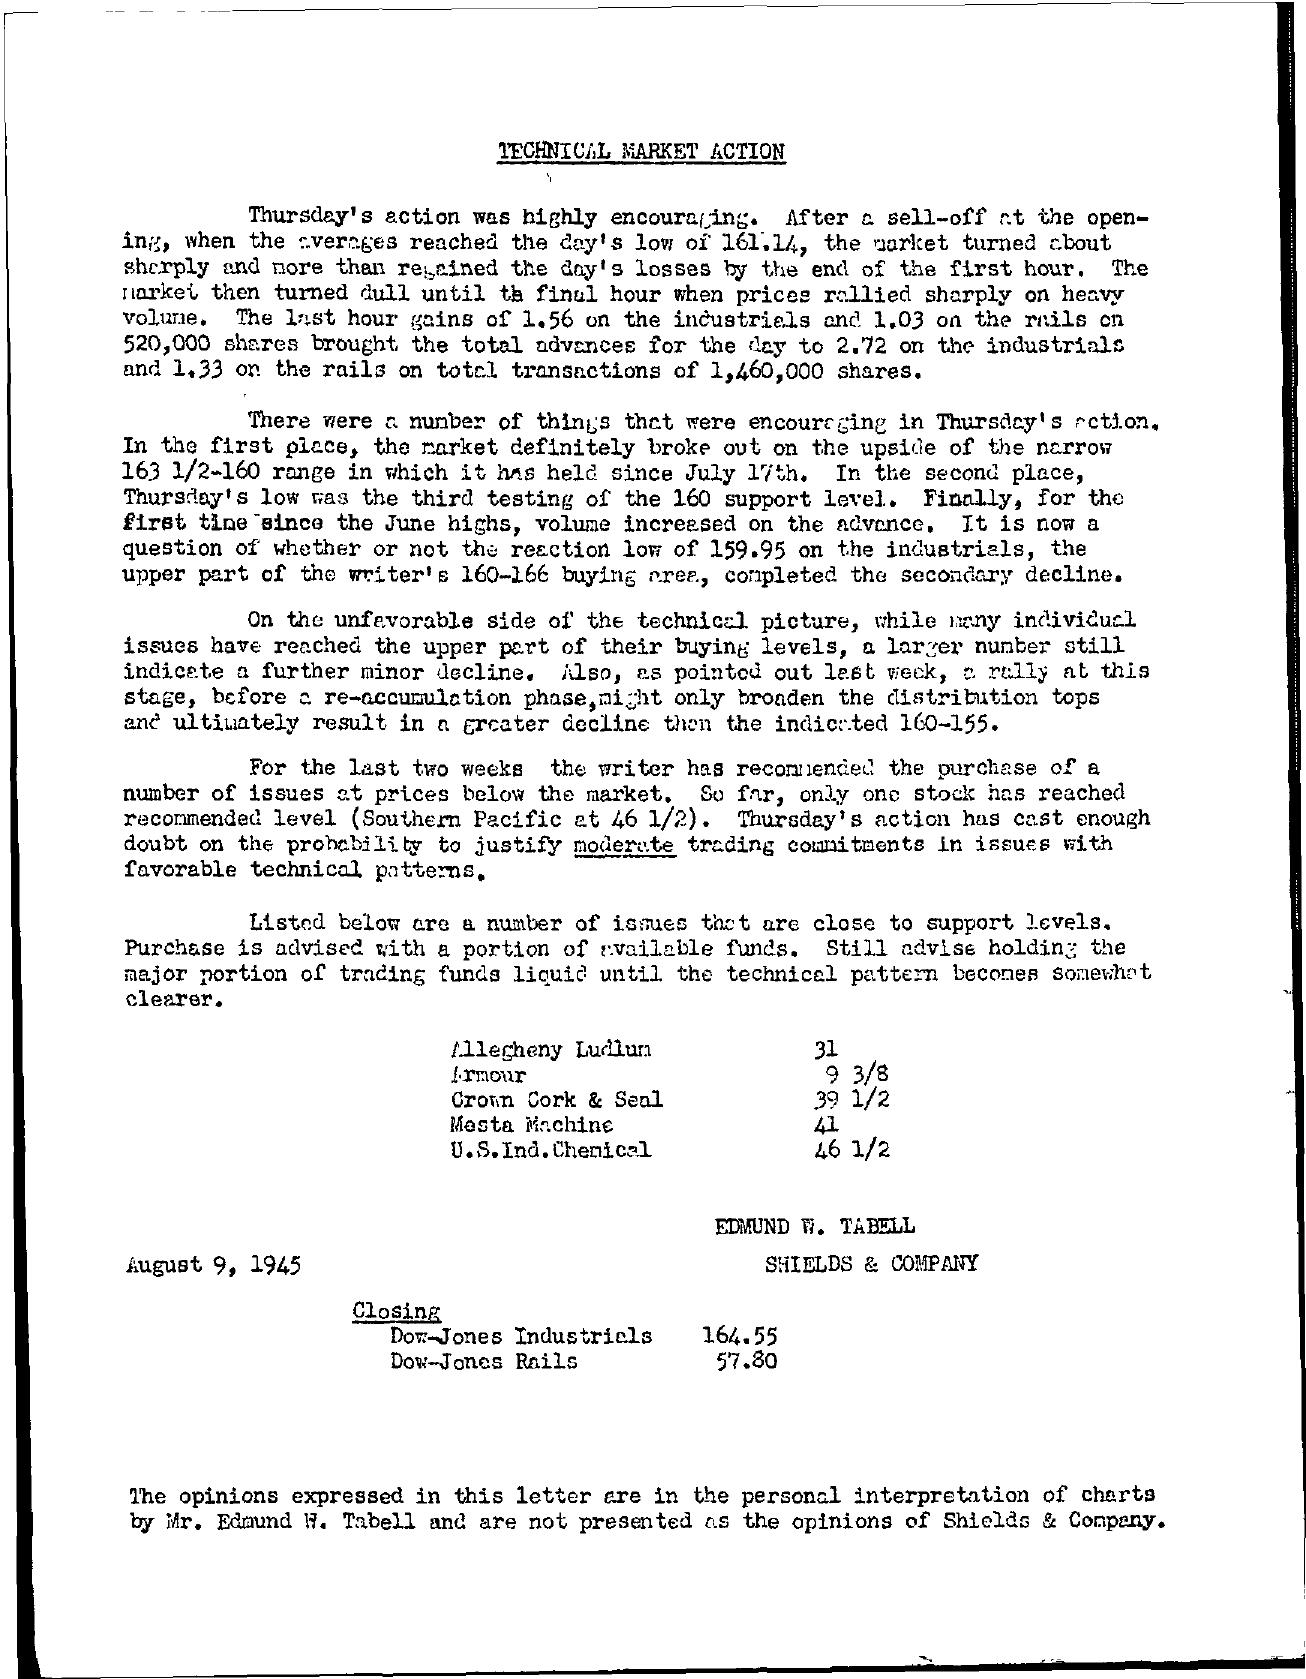 Tabell's Market Letter - August 09, 1945